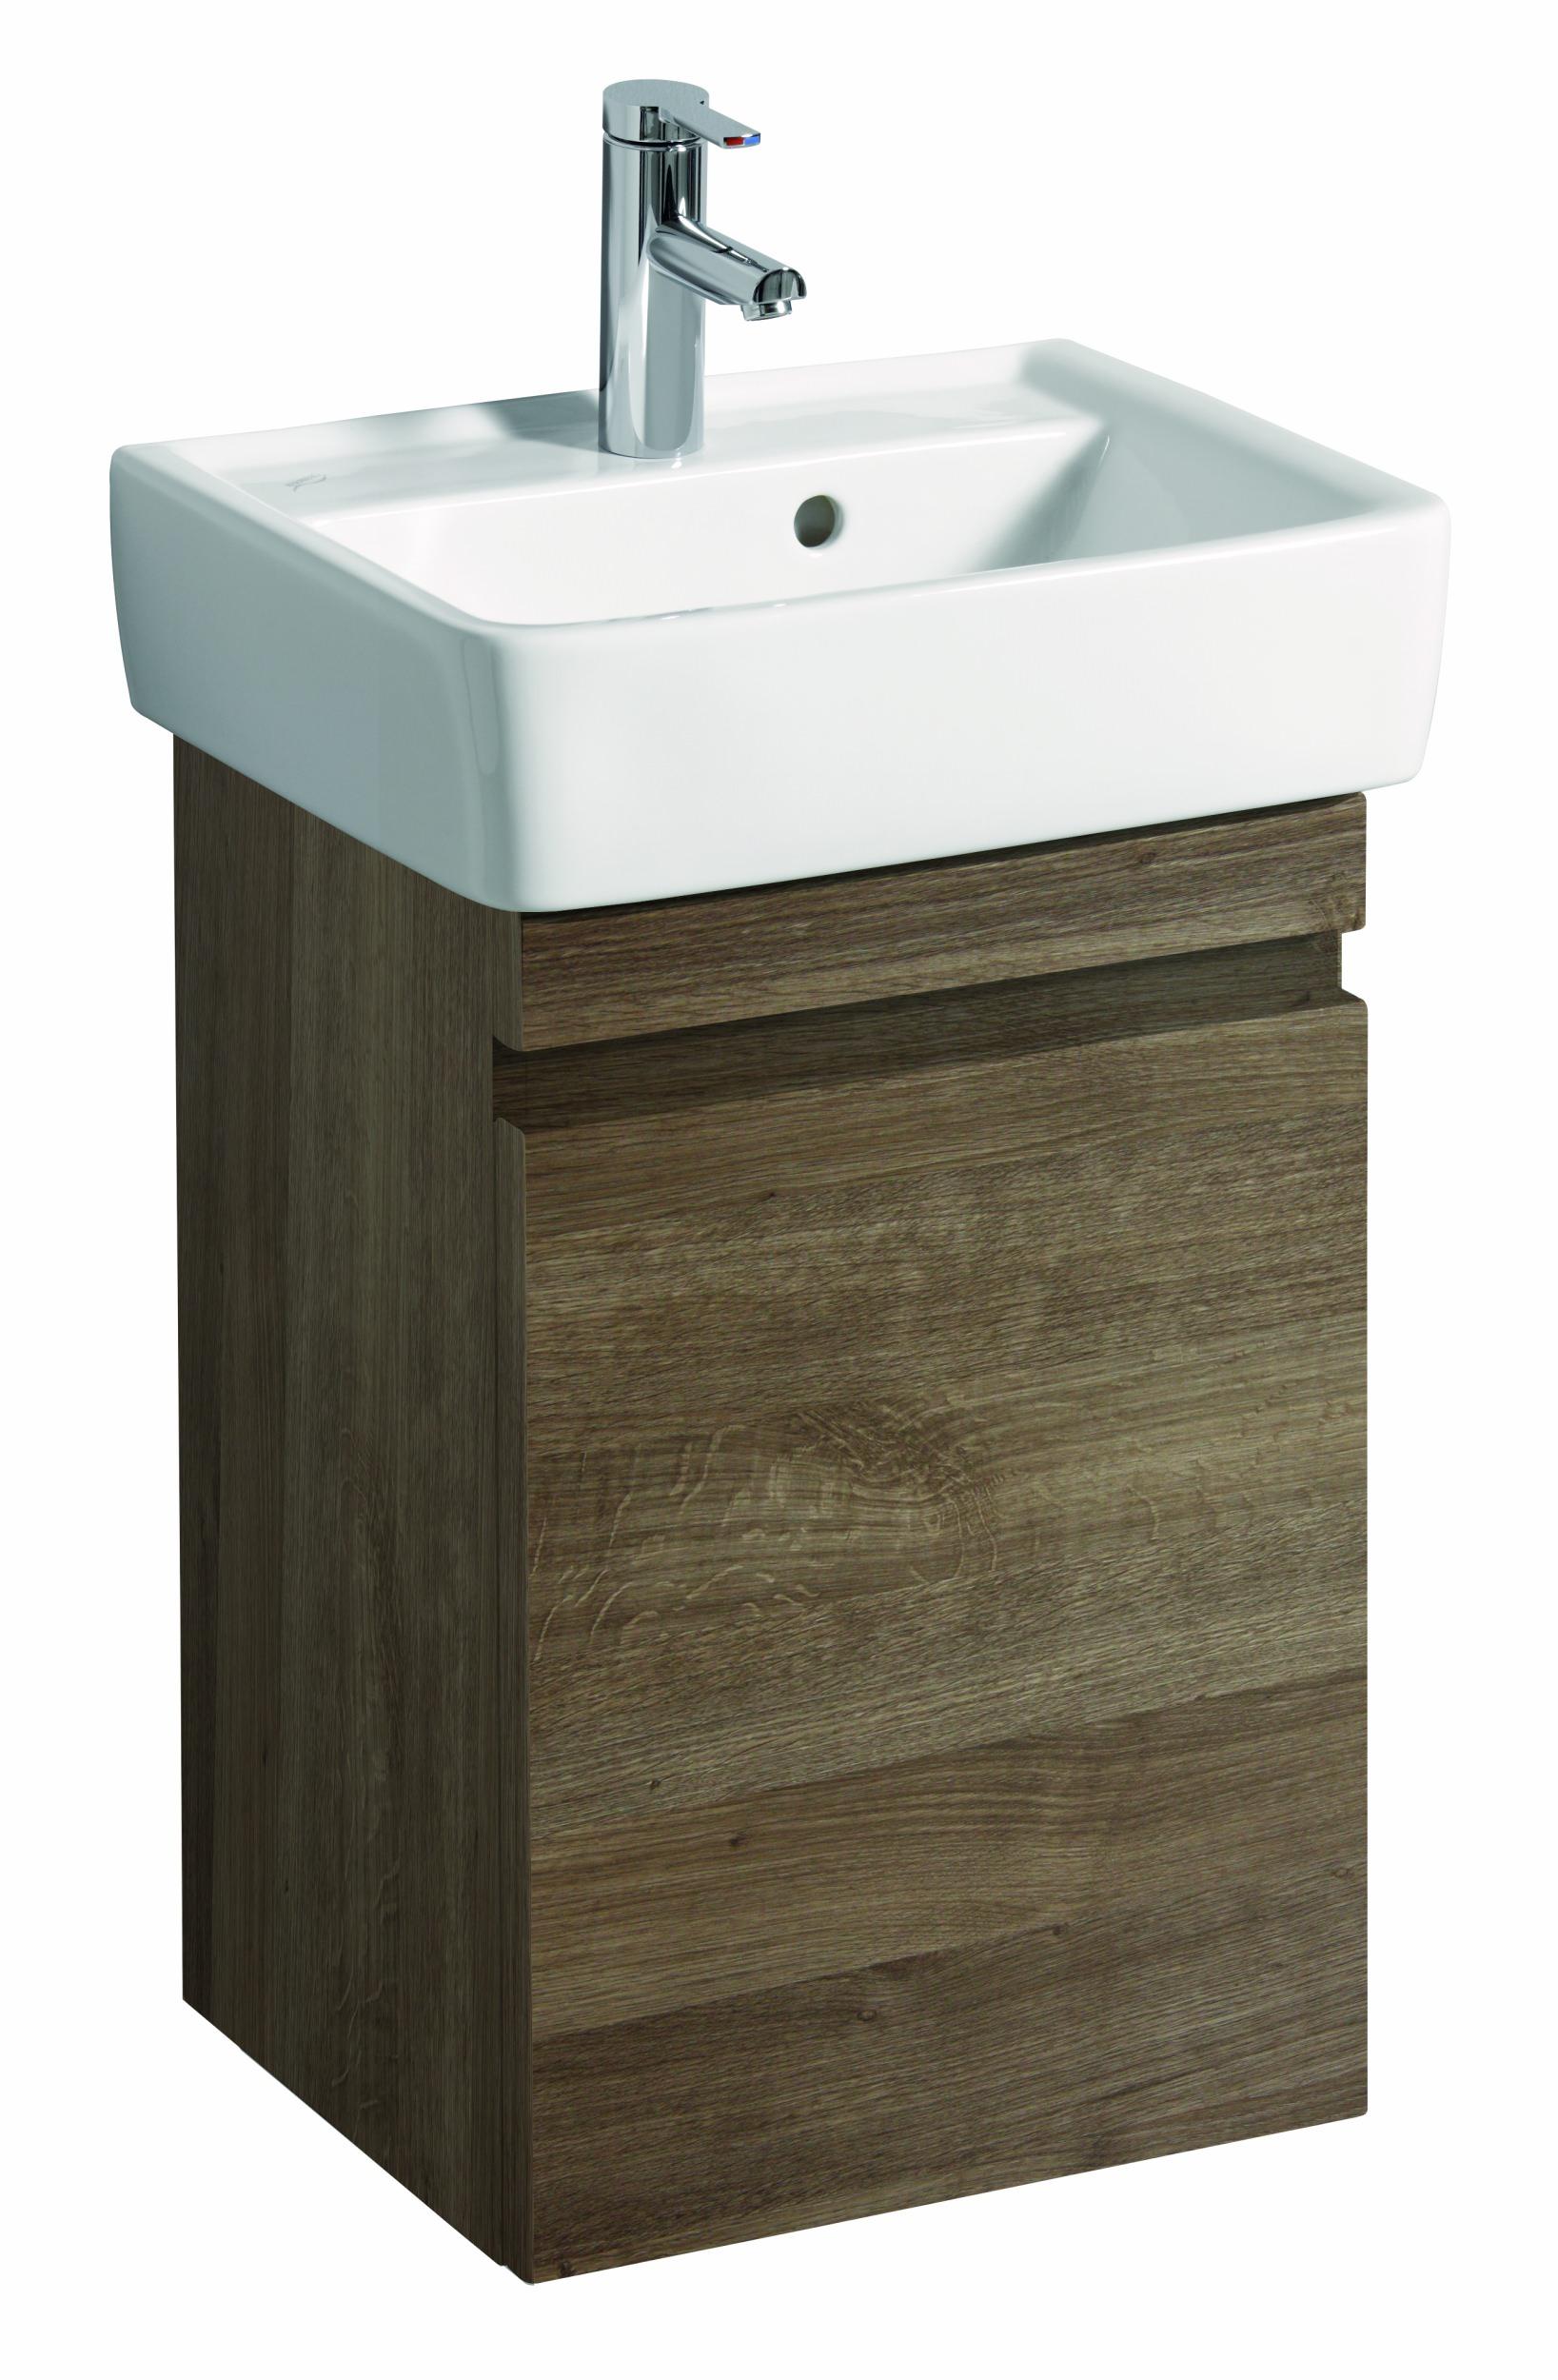 keramag renova nr 1 plan handwaschbecken unterschrank 414x586x345mm eiche natur dunkel. Black Bedroom Furniture Sets. Home Design Ideas